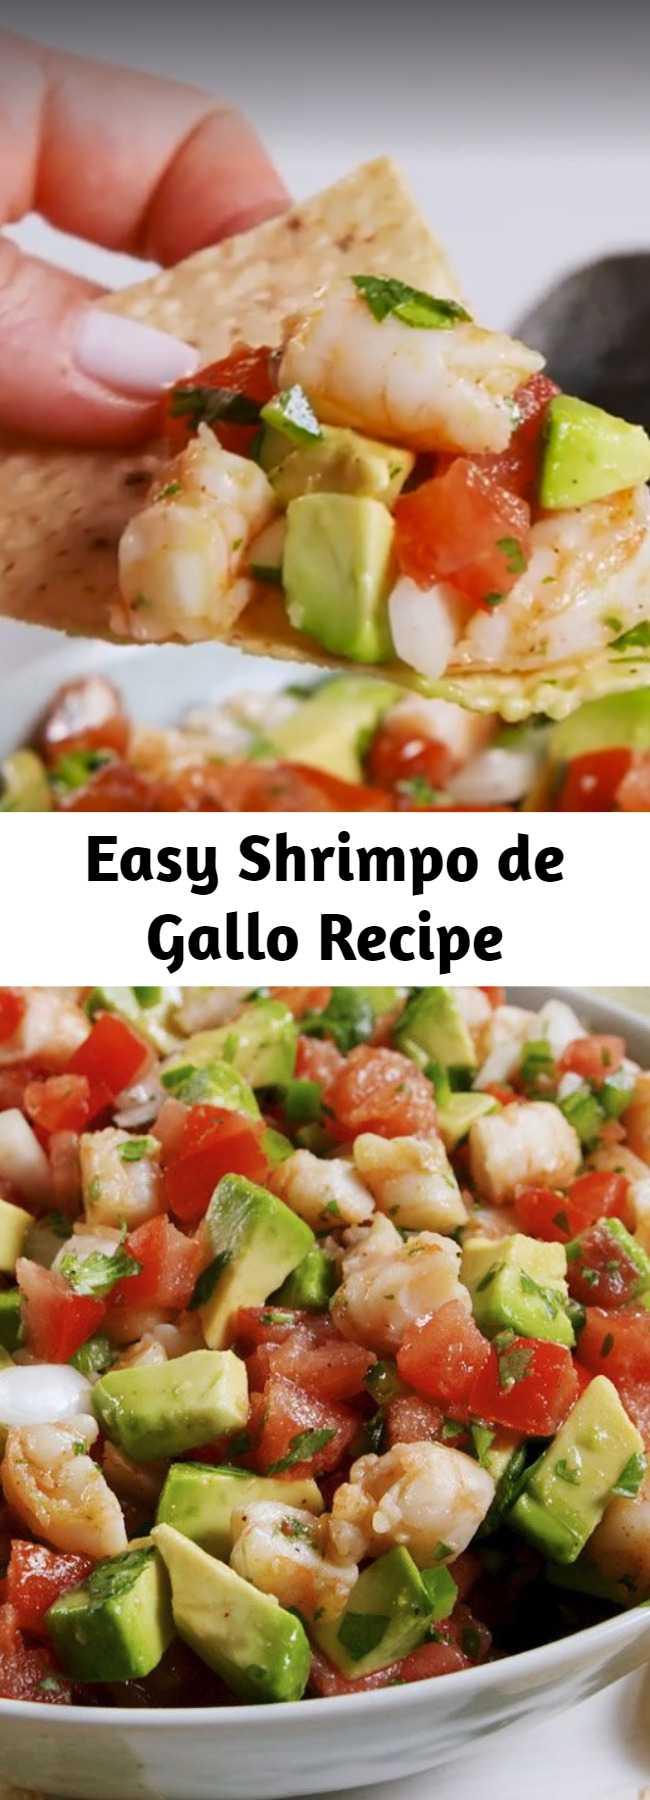 Easy Shrimpo de Gallo Recipe - Once you try this Shrimpo de Gallo, you'll never go back to pico. #shrimp #tomato #avocado #dip #partyapps #fiesta #seafoodappetizers